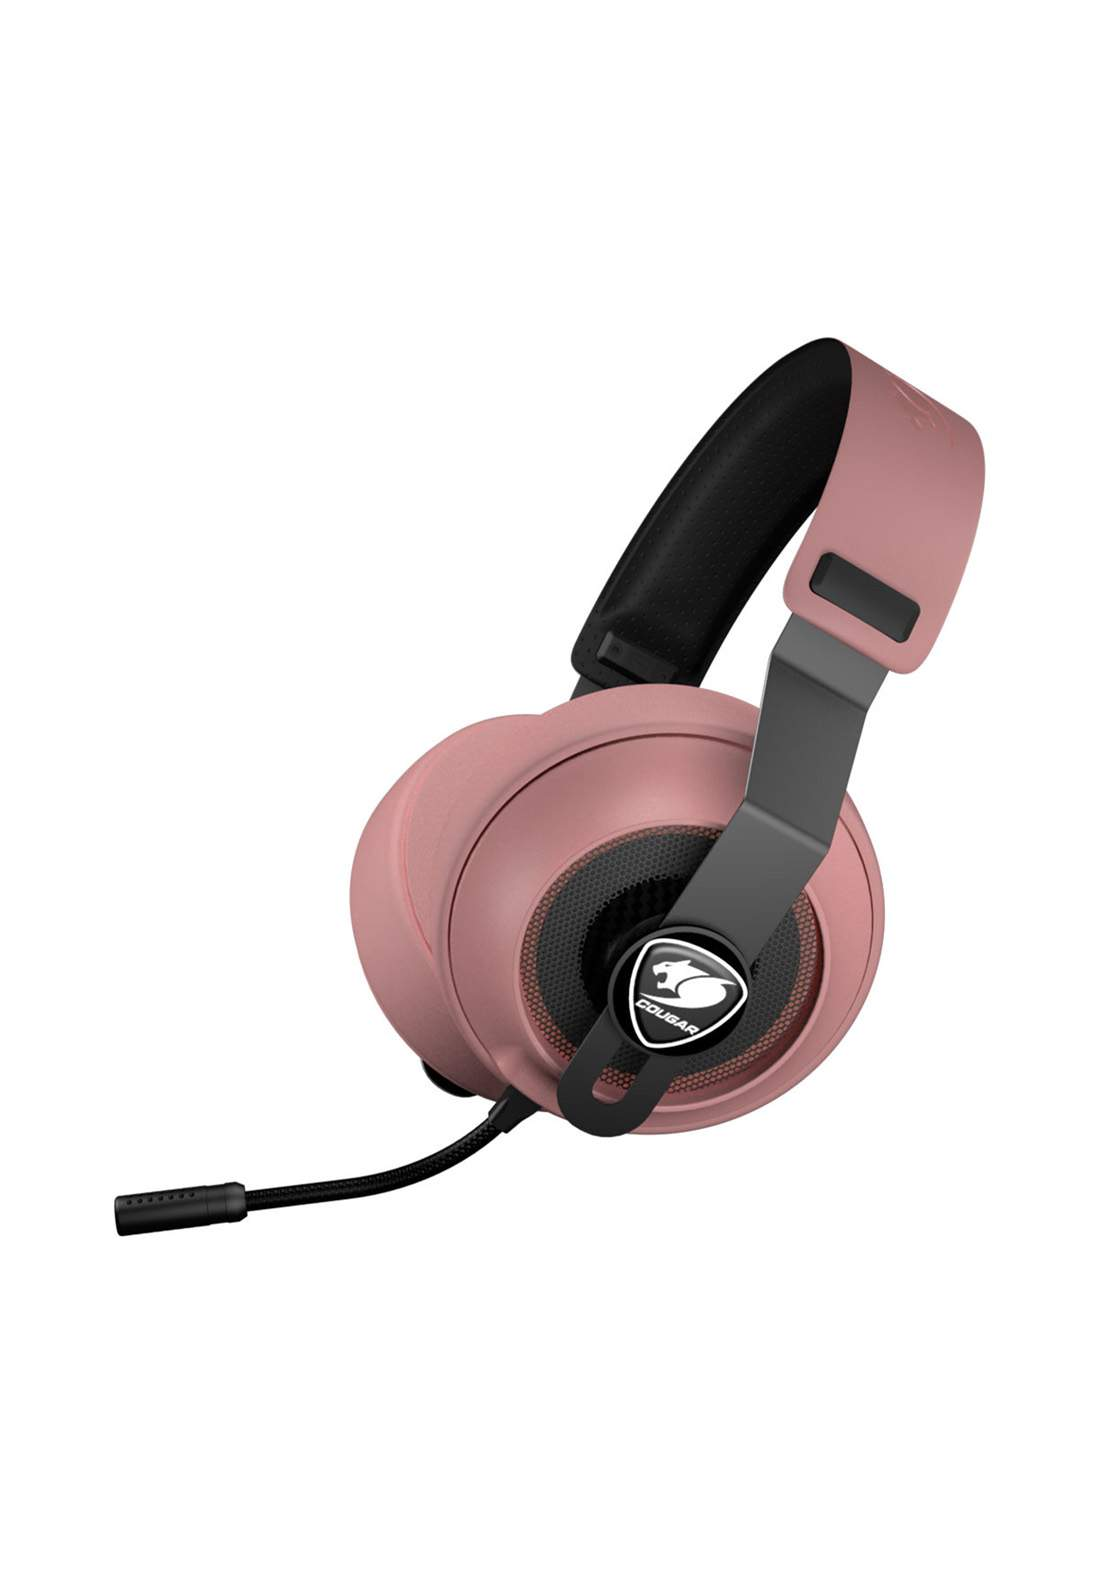 Cougar Phontum Essential Gaming Headset - Pink سماعة